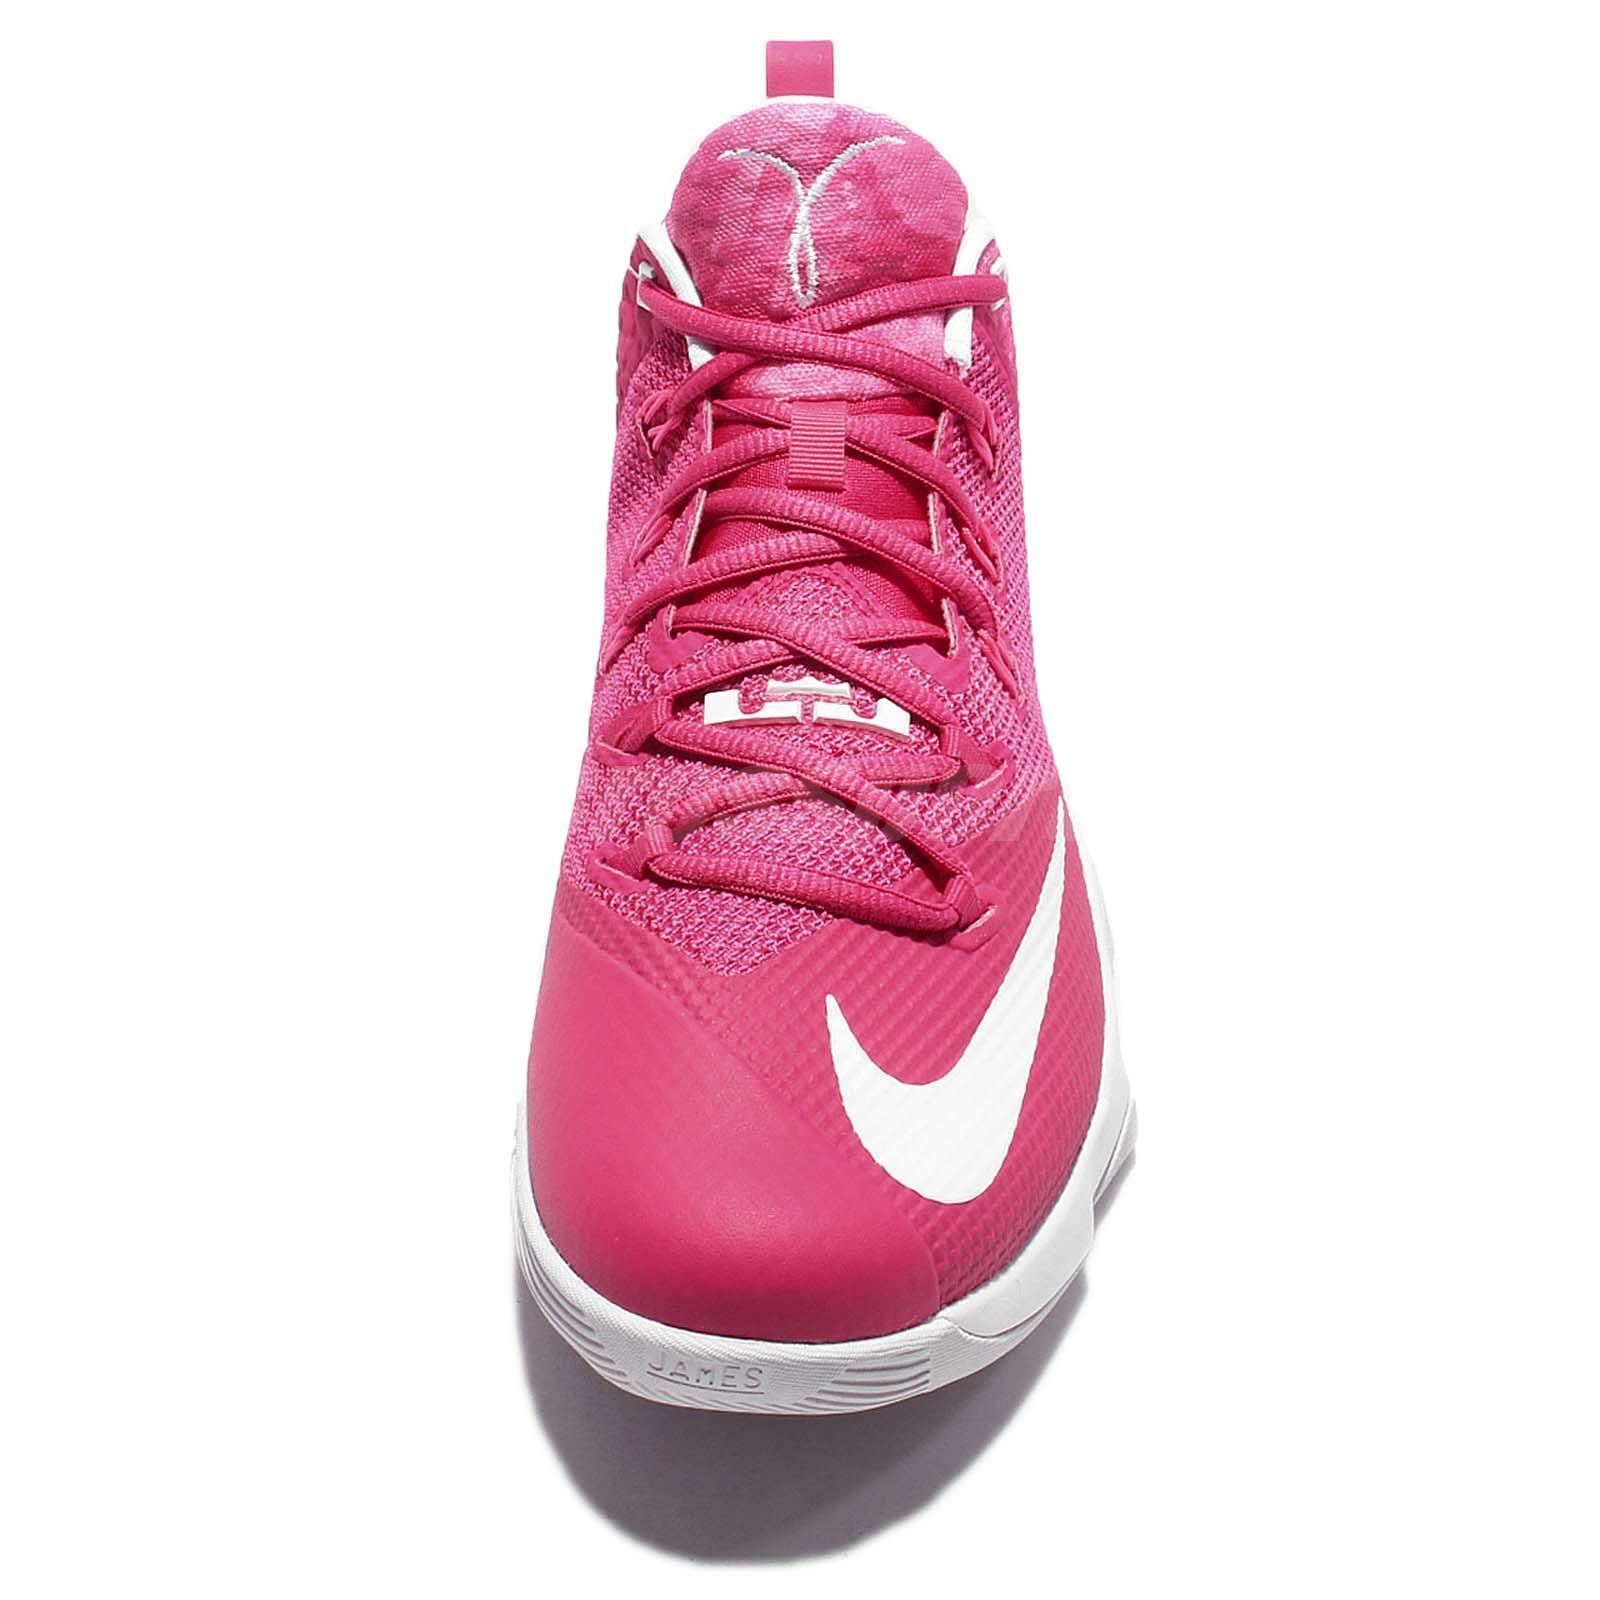 88edf74b8898c Nike Lebron Ambassador 9 - Kay Yow - Front - WearTesters